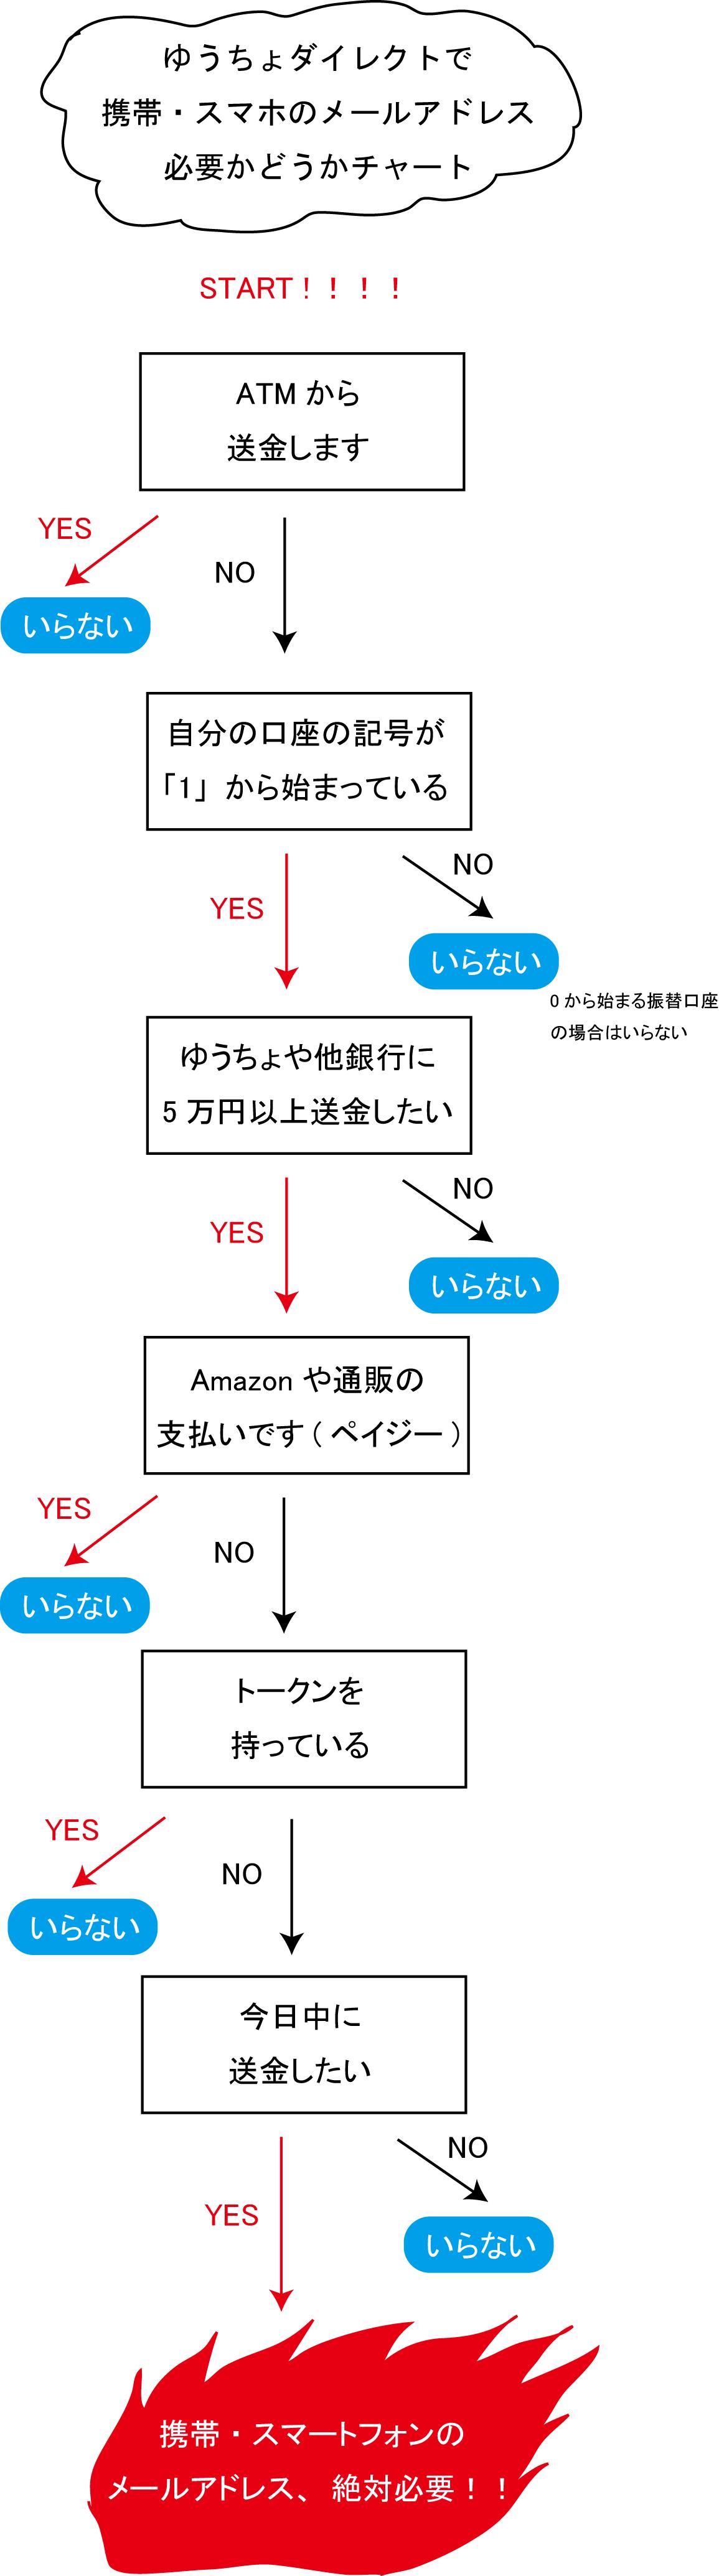 yuucho-chart